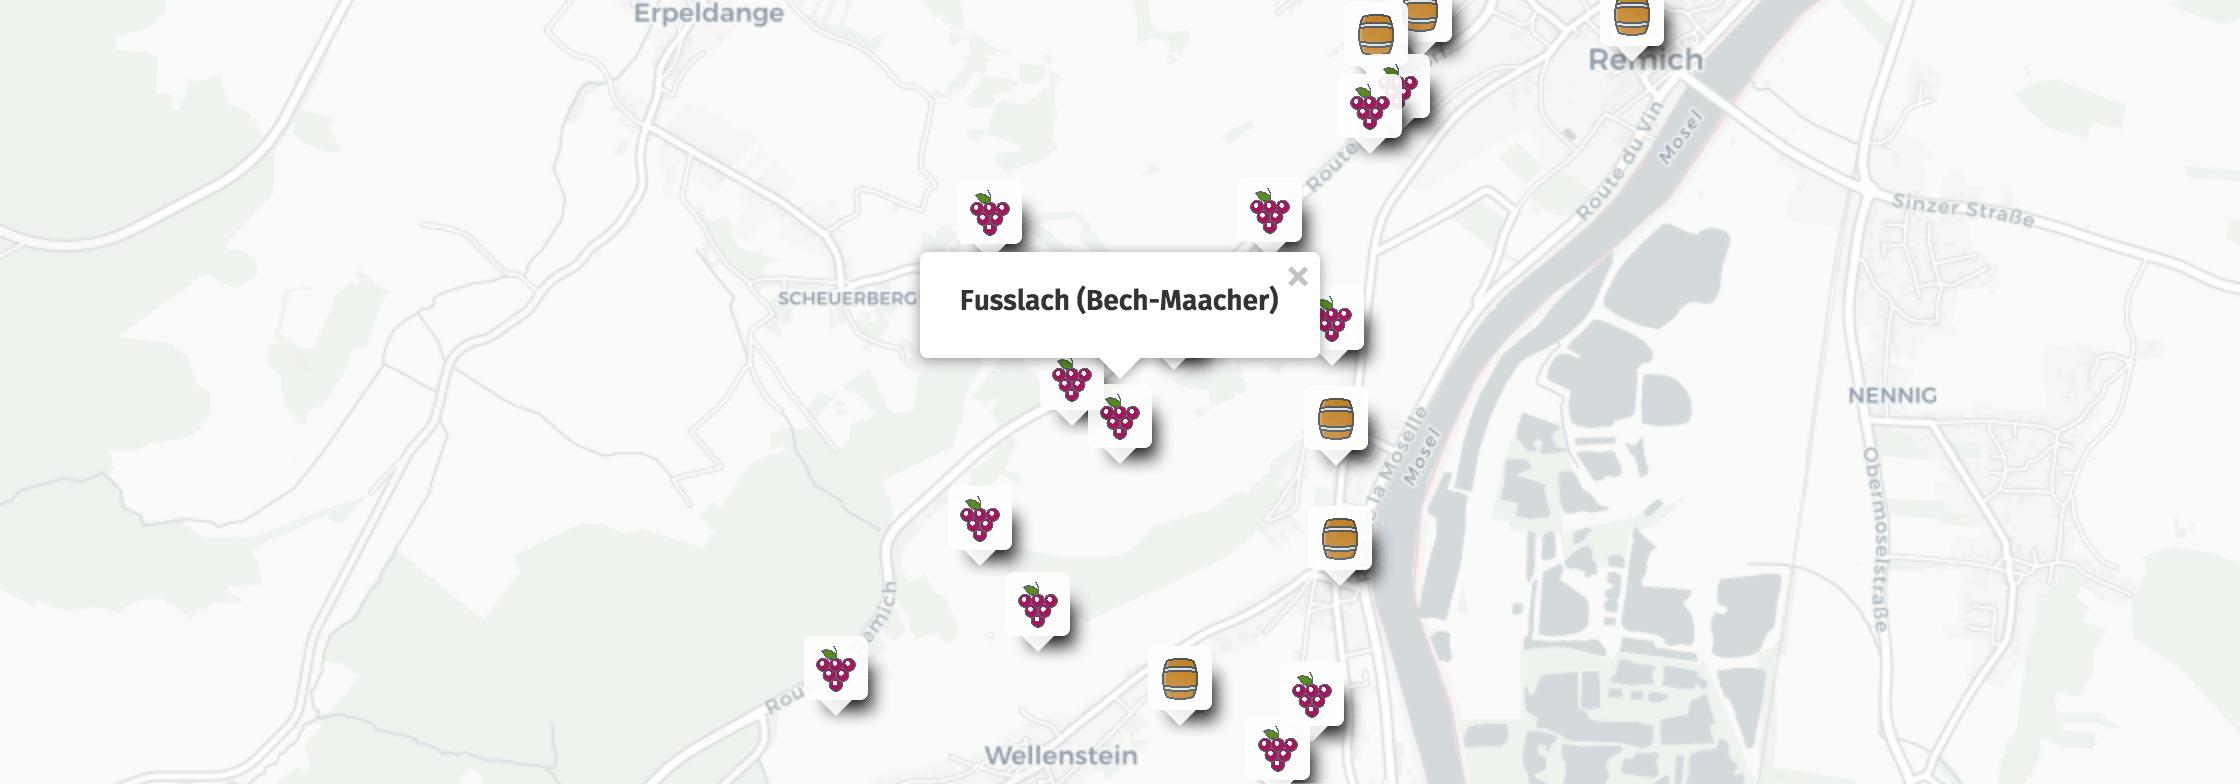 Geolocation of Fusslach wines in Bech-Kleinmacher